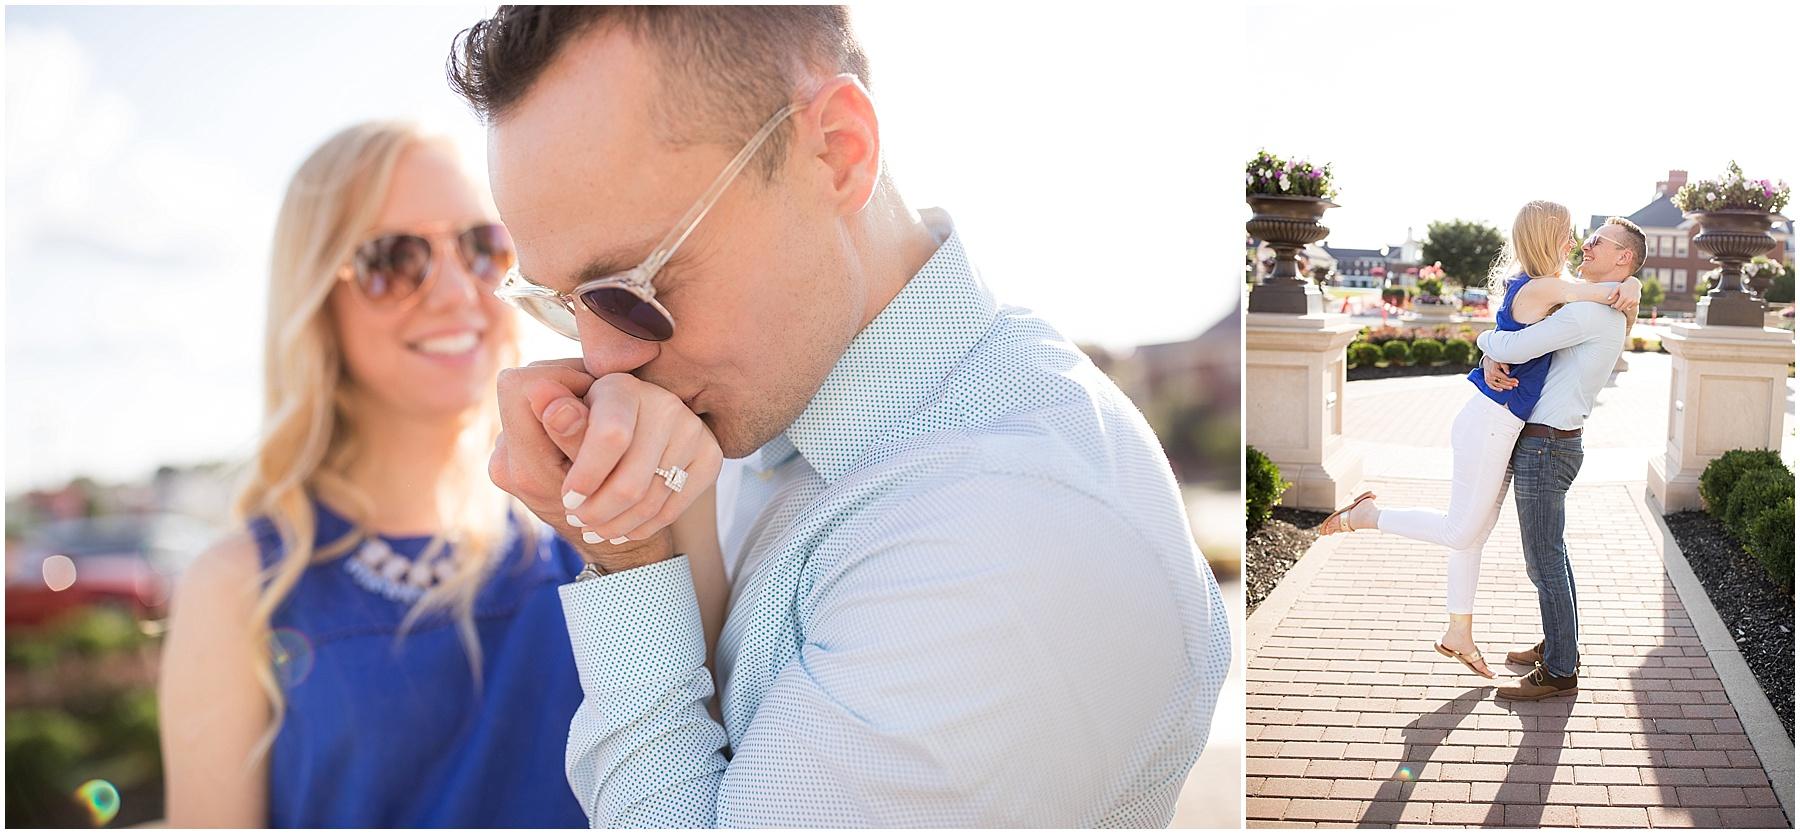 Spouse kissing his soon to be brides hand. Indianapolis Engagement Photographer, Raindancer Studios